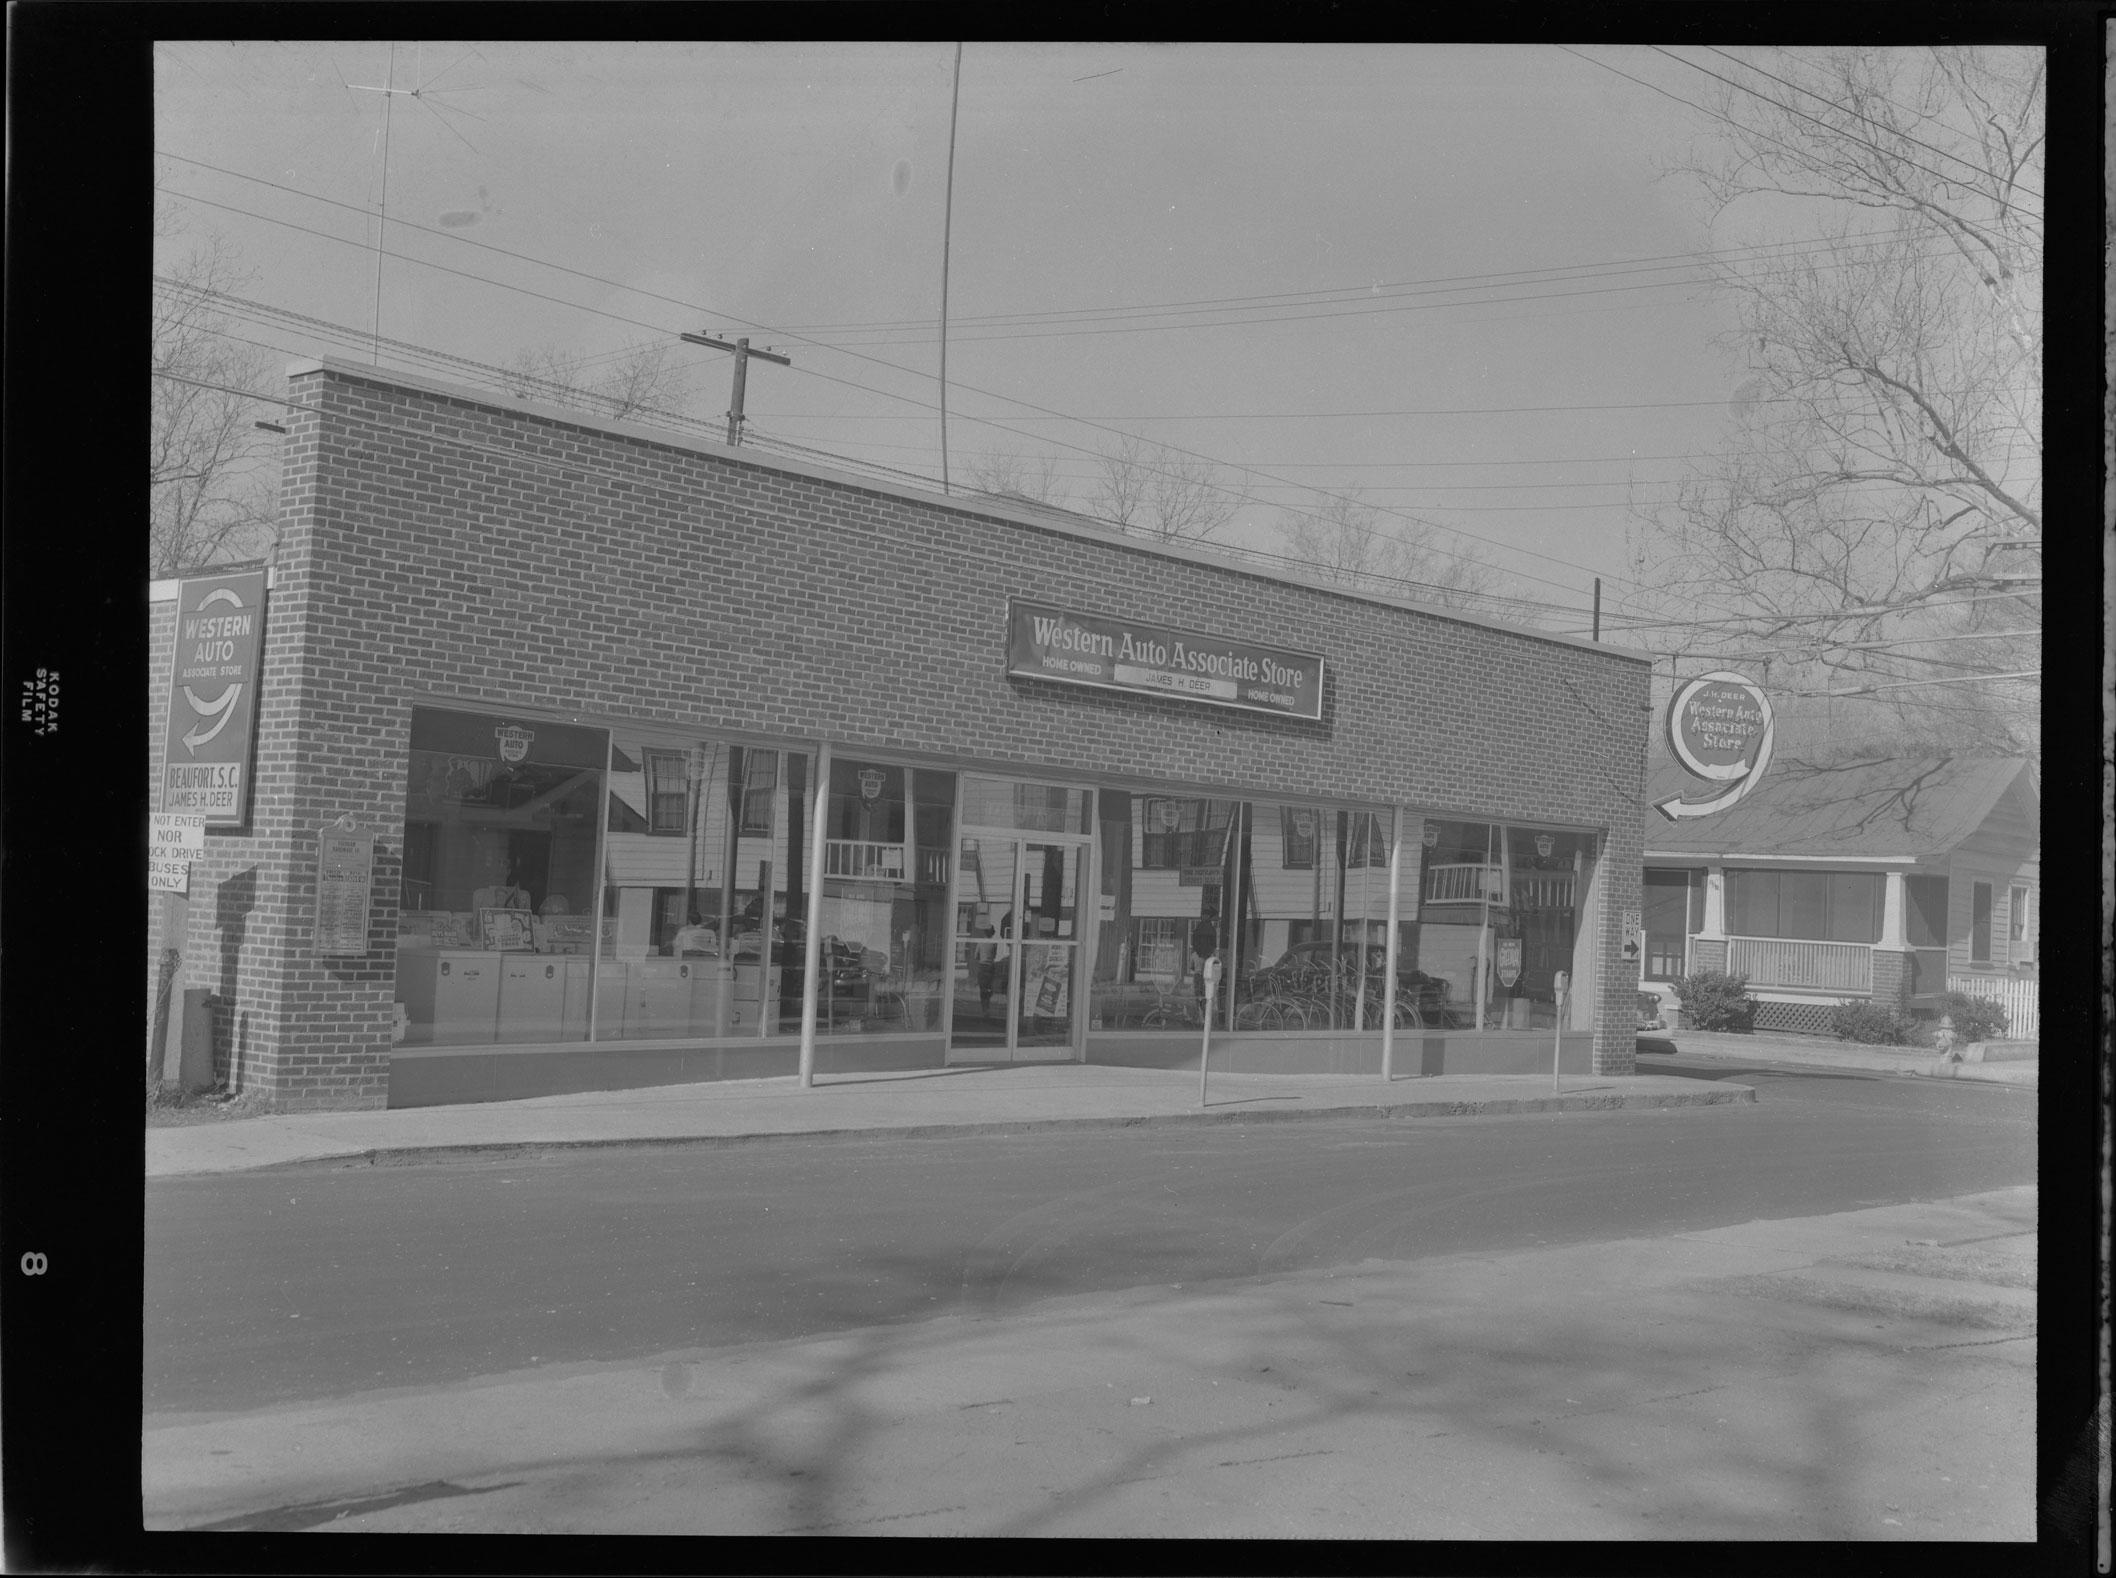 Western Auto Associate Store